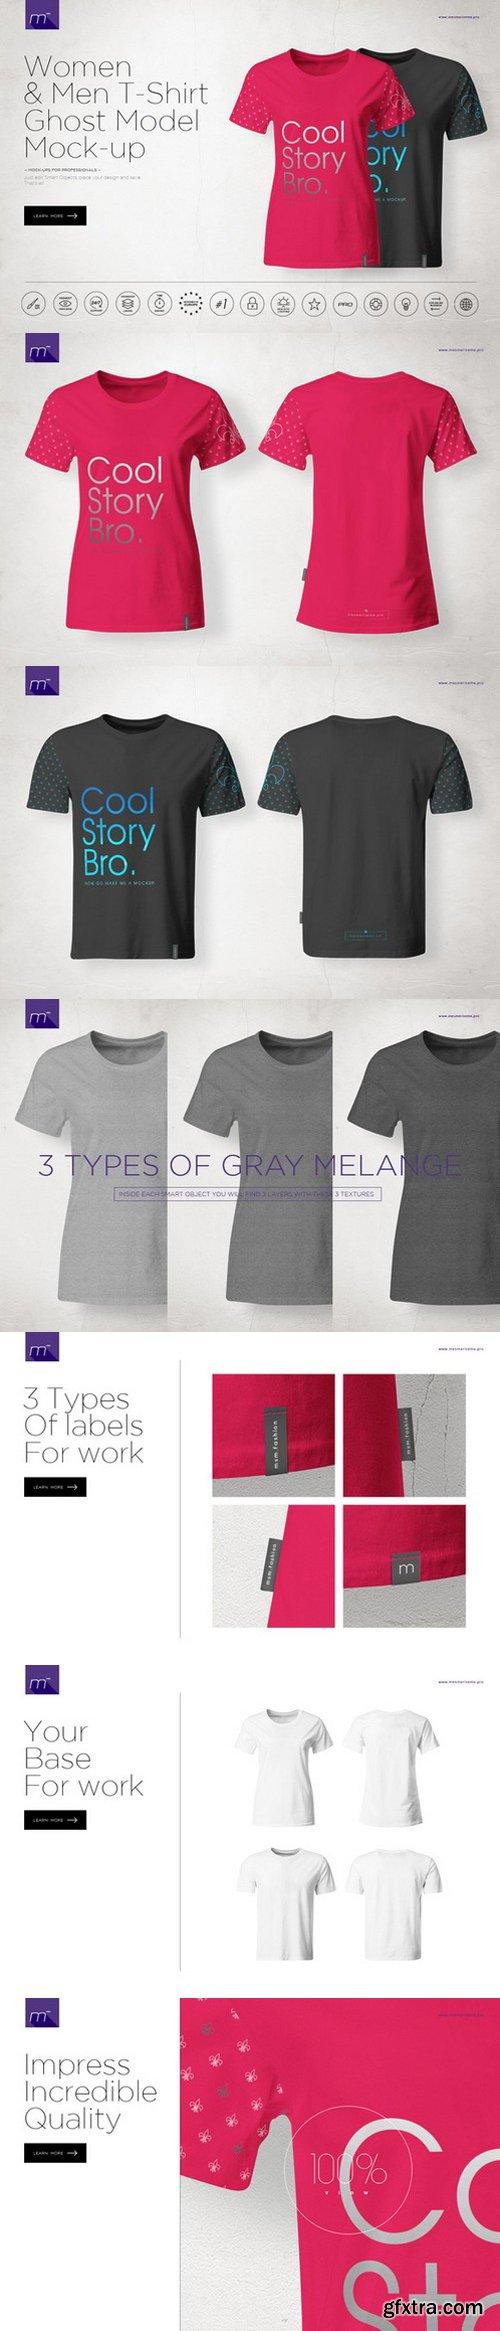 CM - Men & Women Ghost T-shirt Mock-up 541278